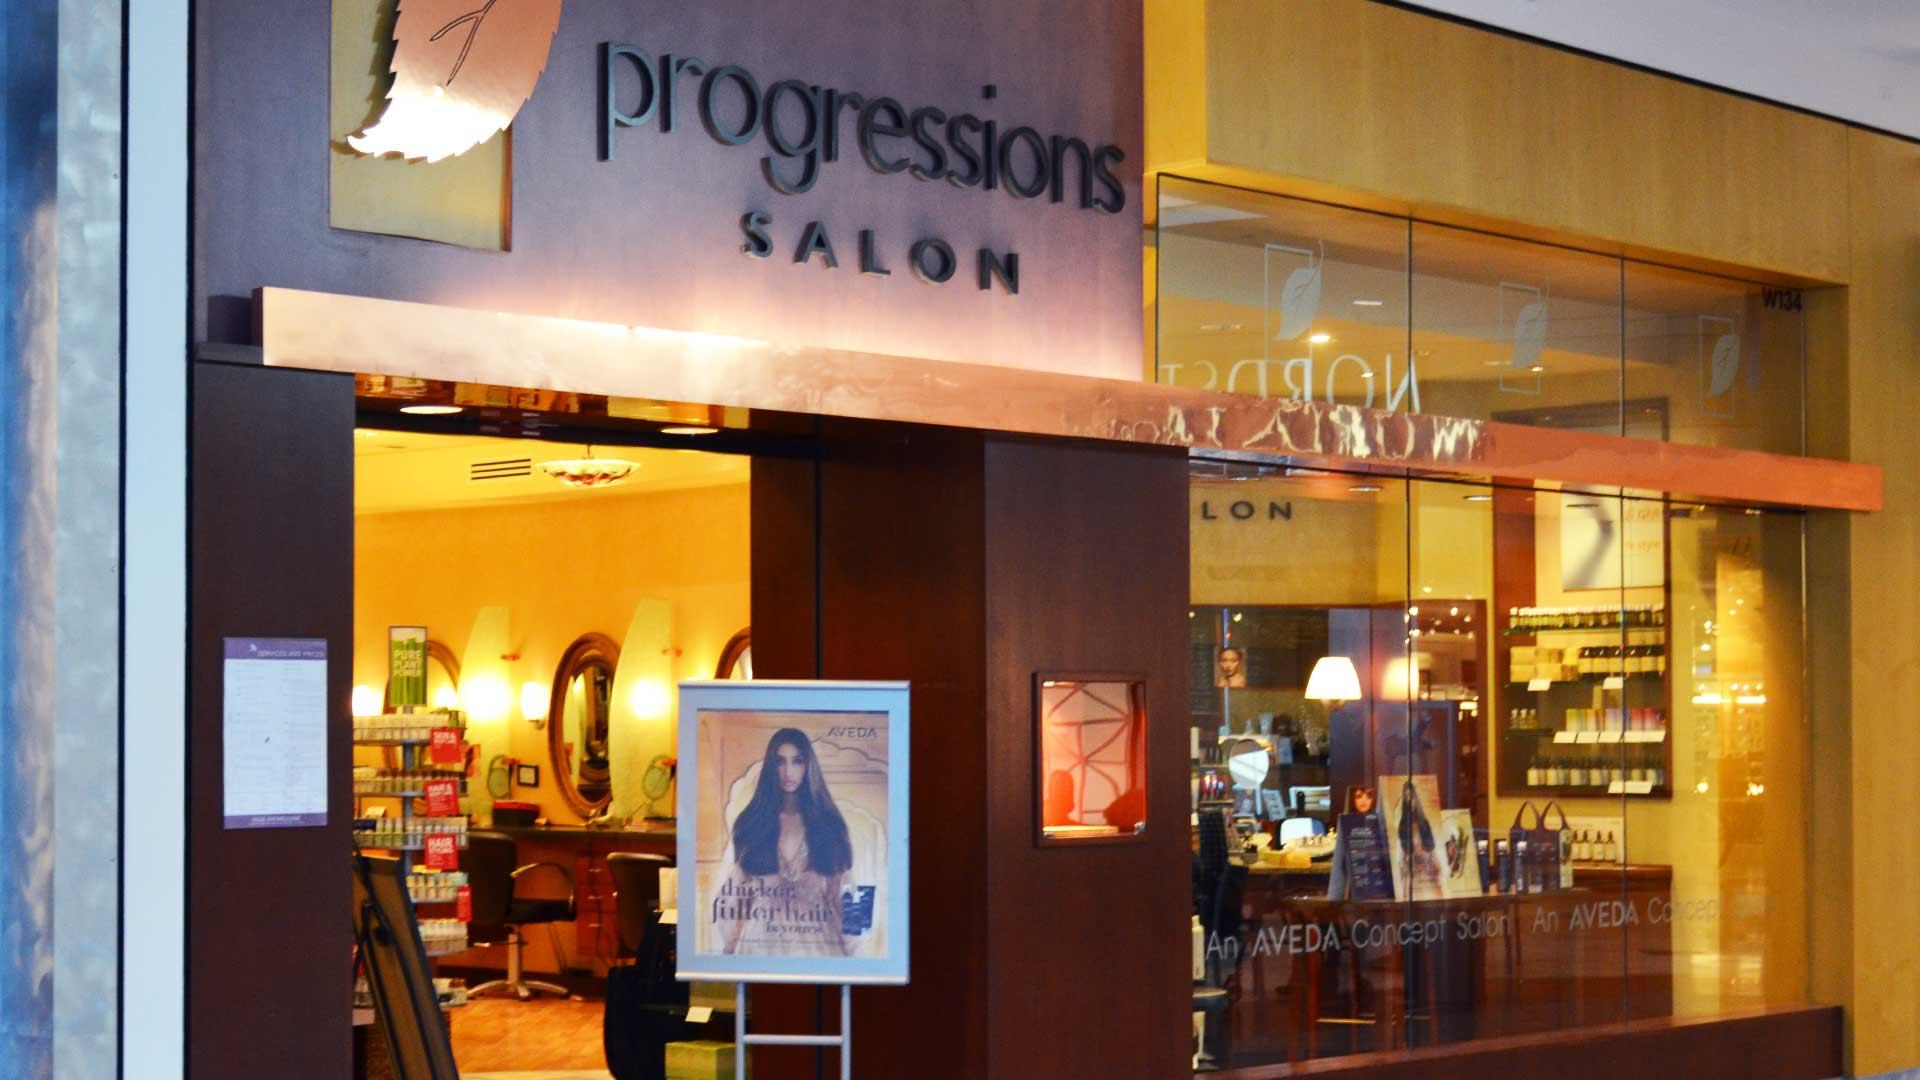 Progressions Salon